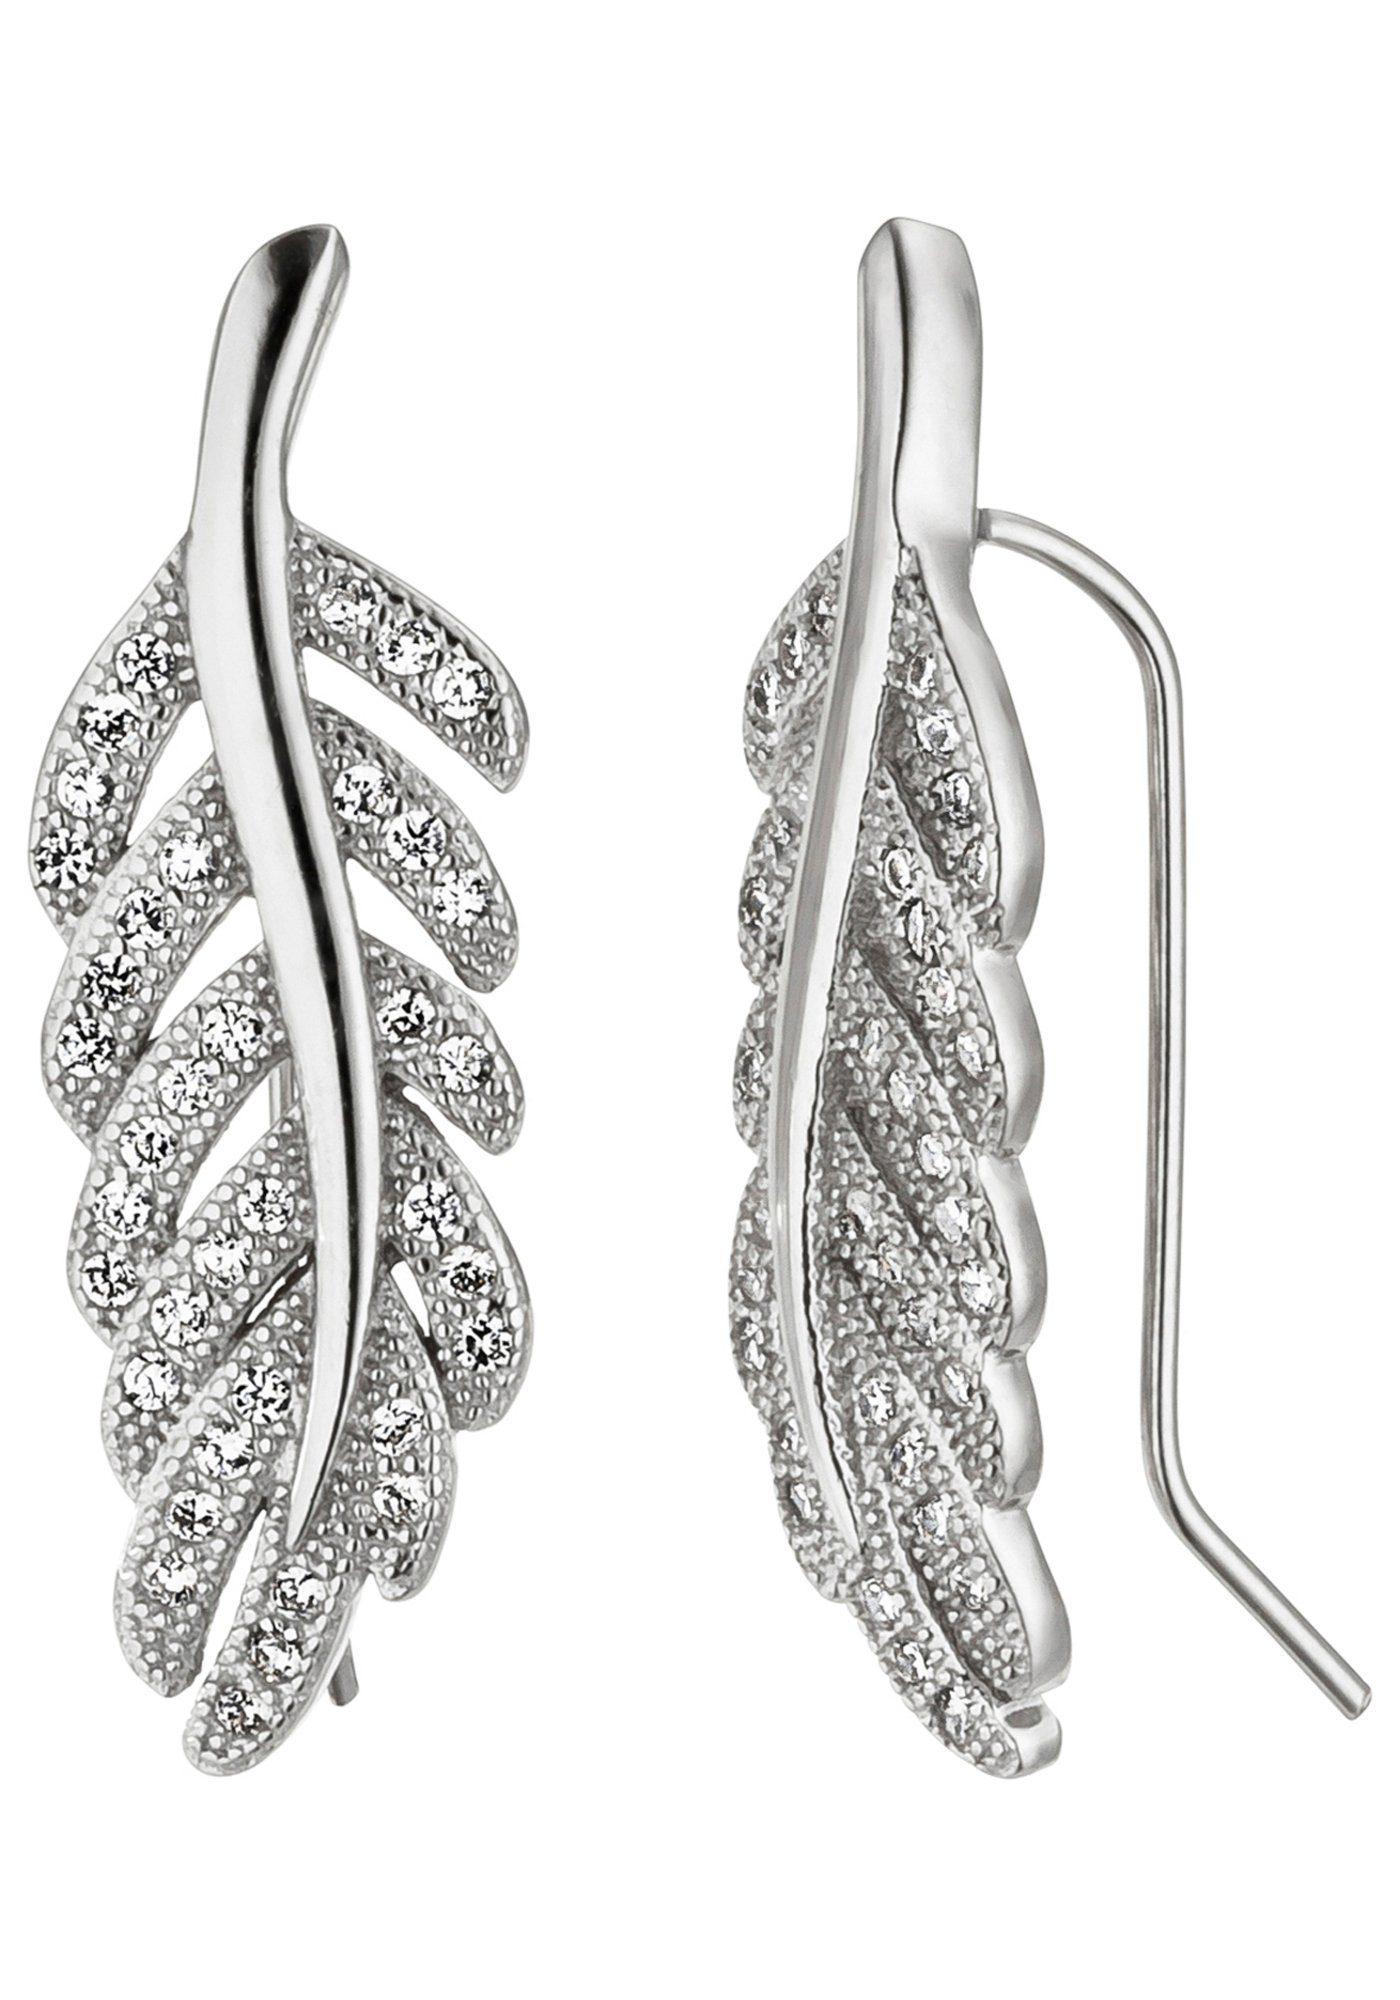 JOBO Paar Ohrhänger »Feder« 925 Silber mit Zirkonia